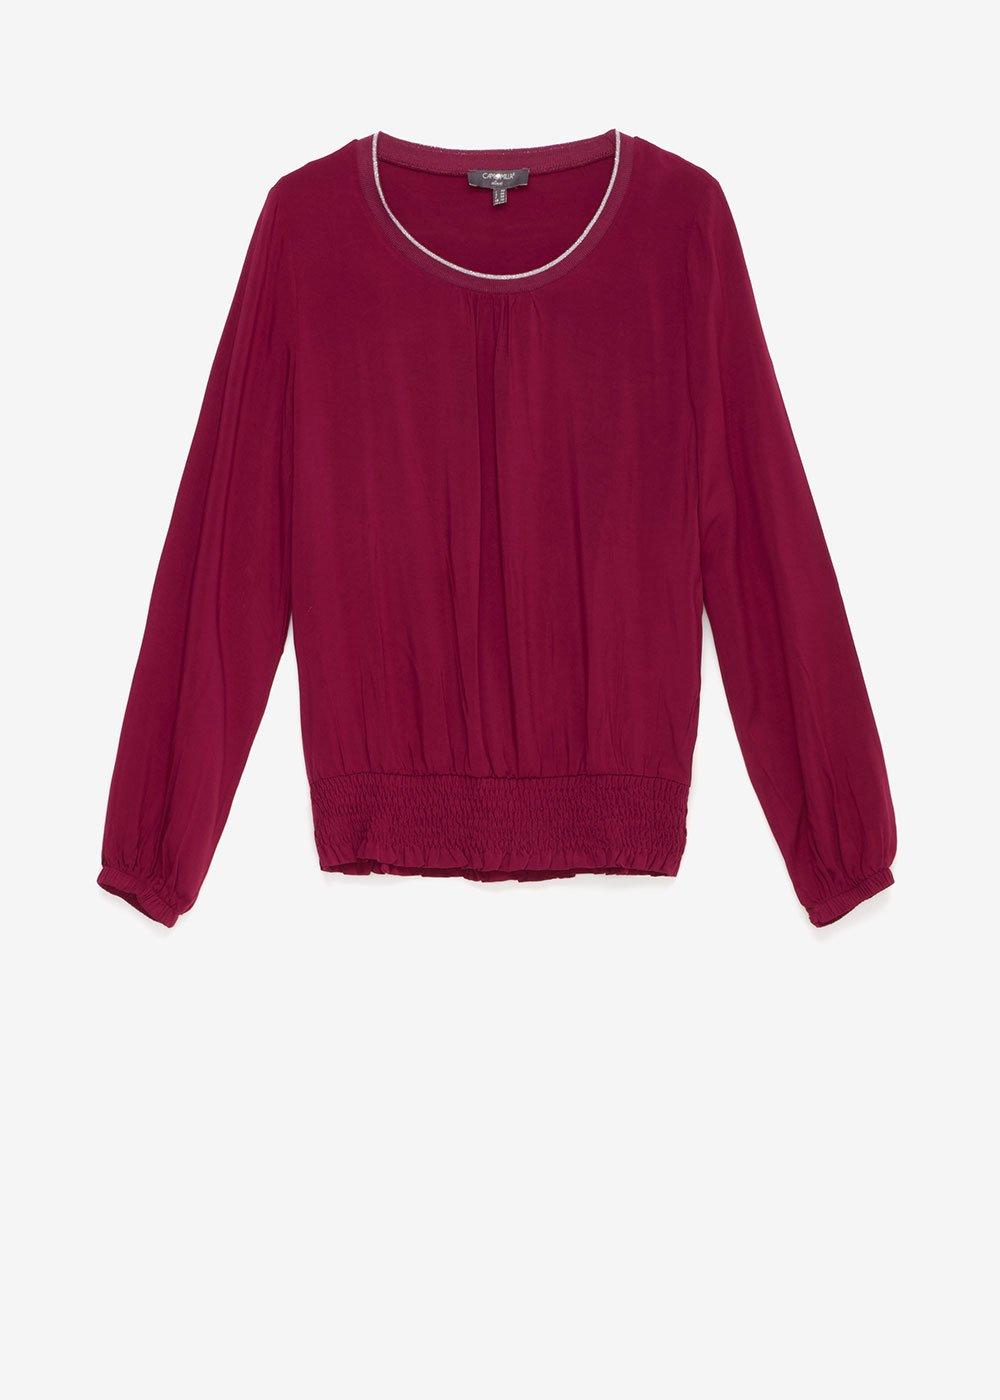 Samantha round-neck t-shirt - Rosee' - Woman